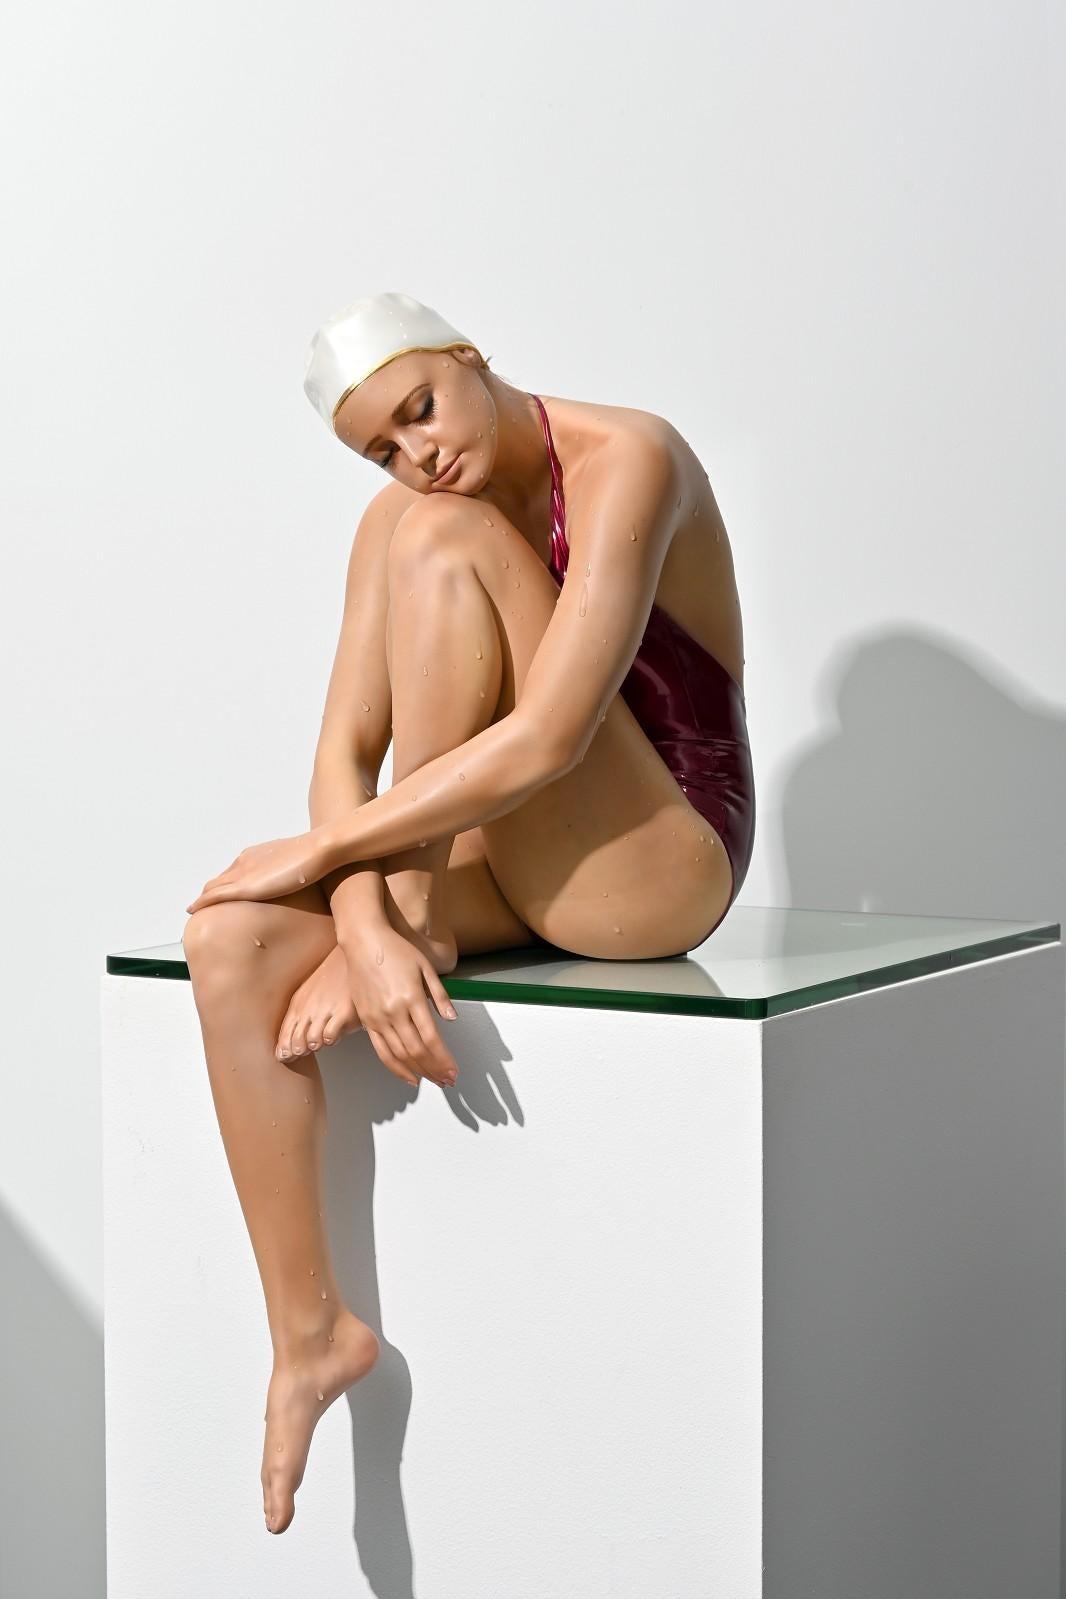 Serenity 1/8 - hyperrealism, female swimmer, cast resin sculpture